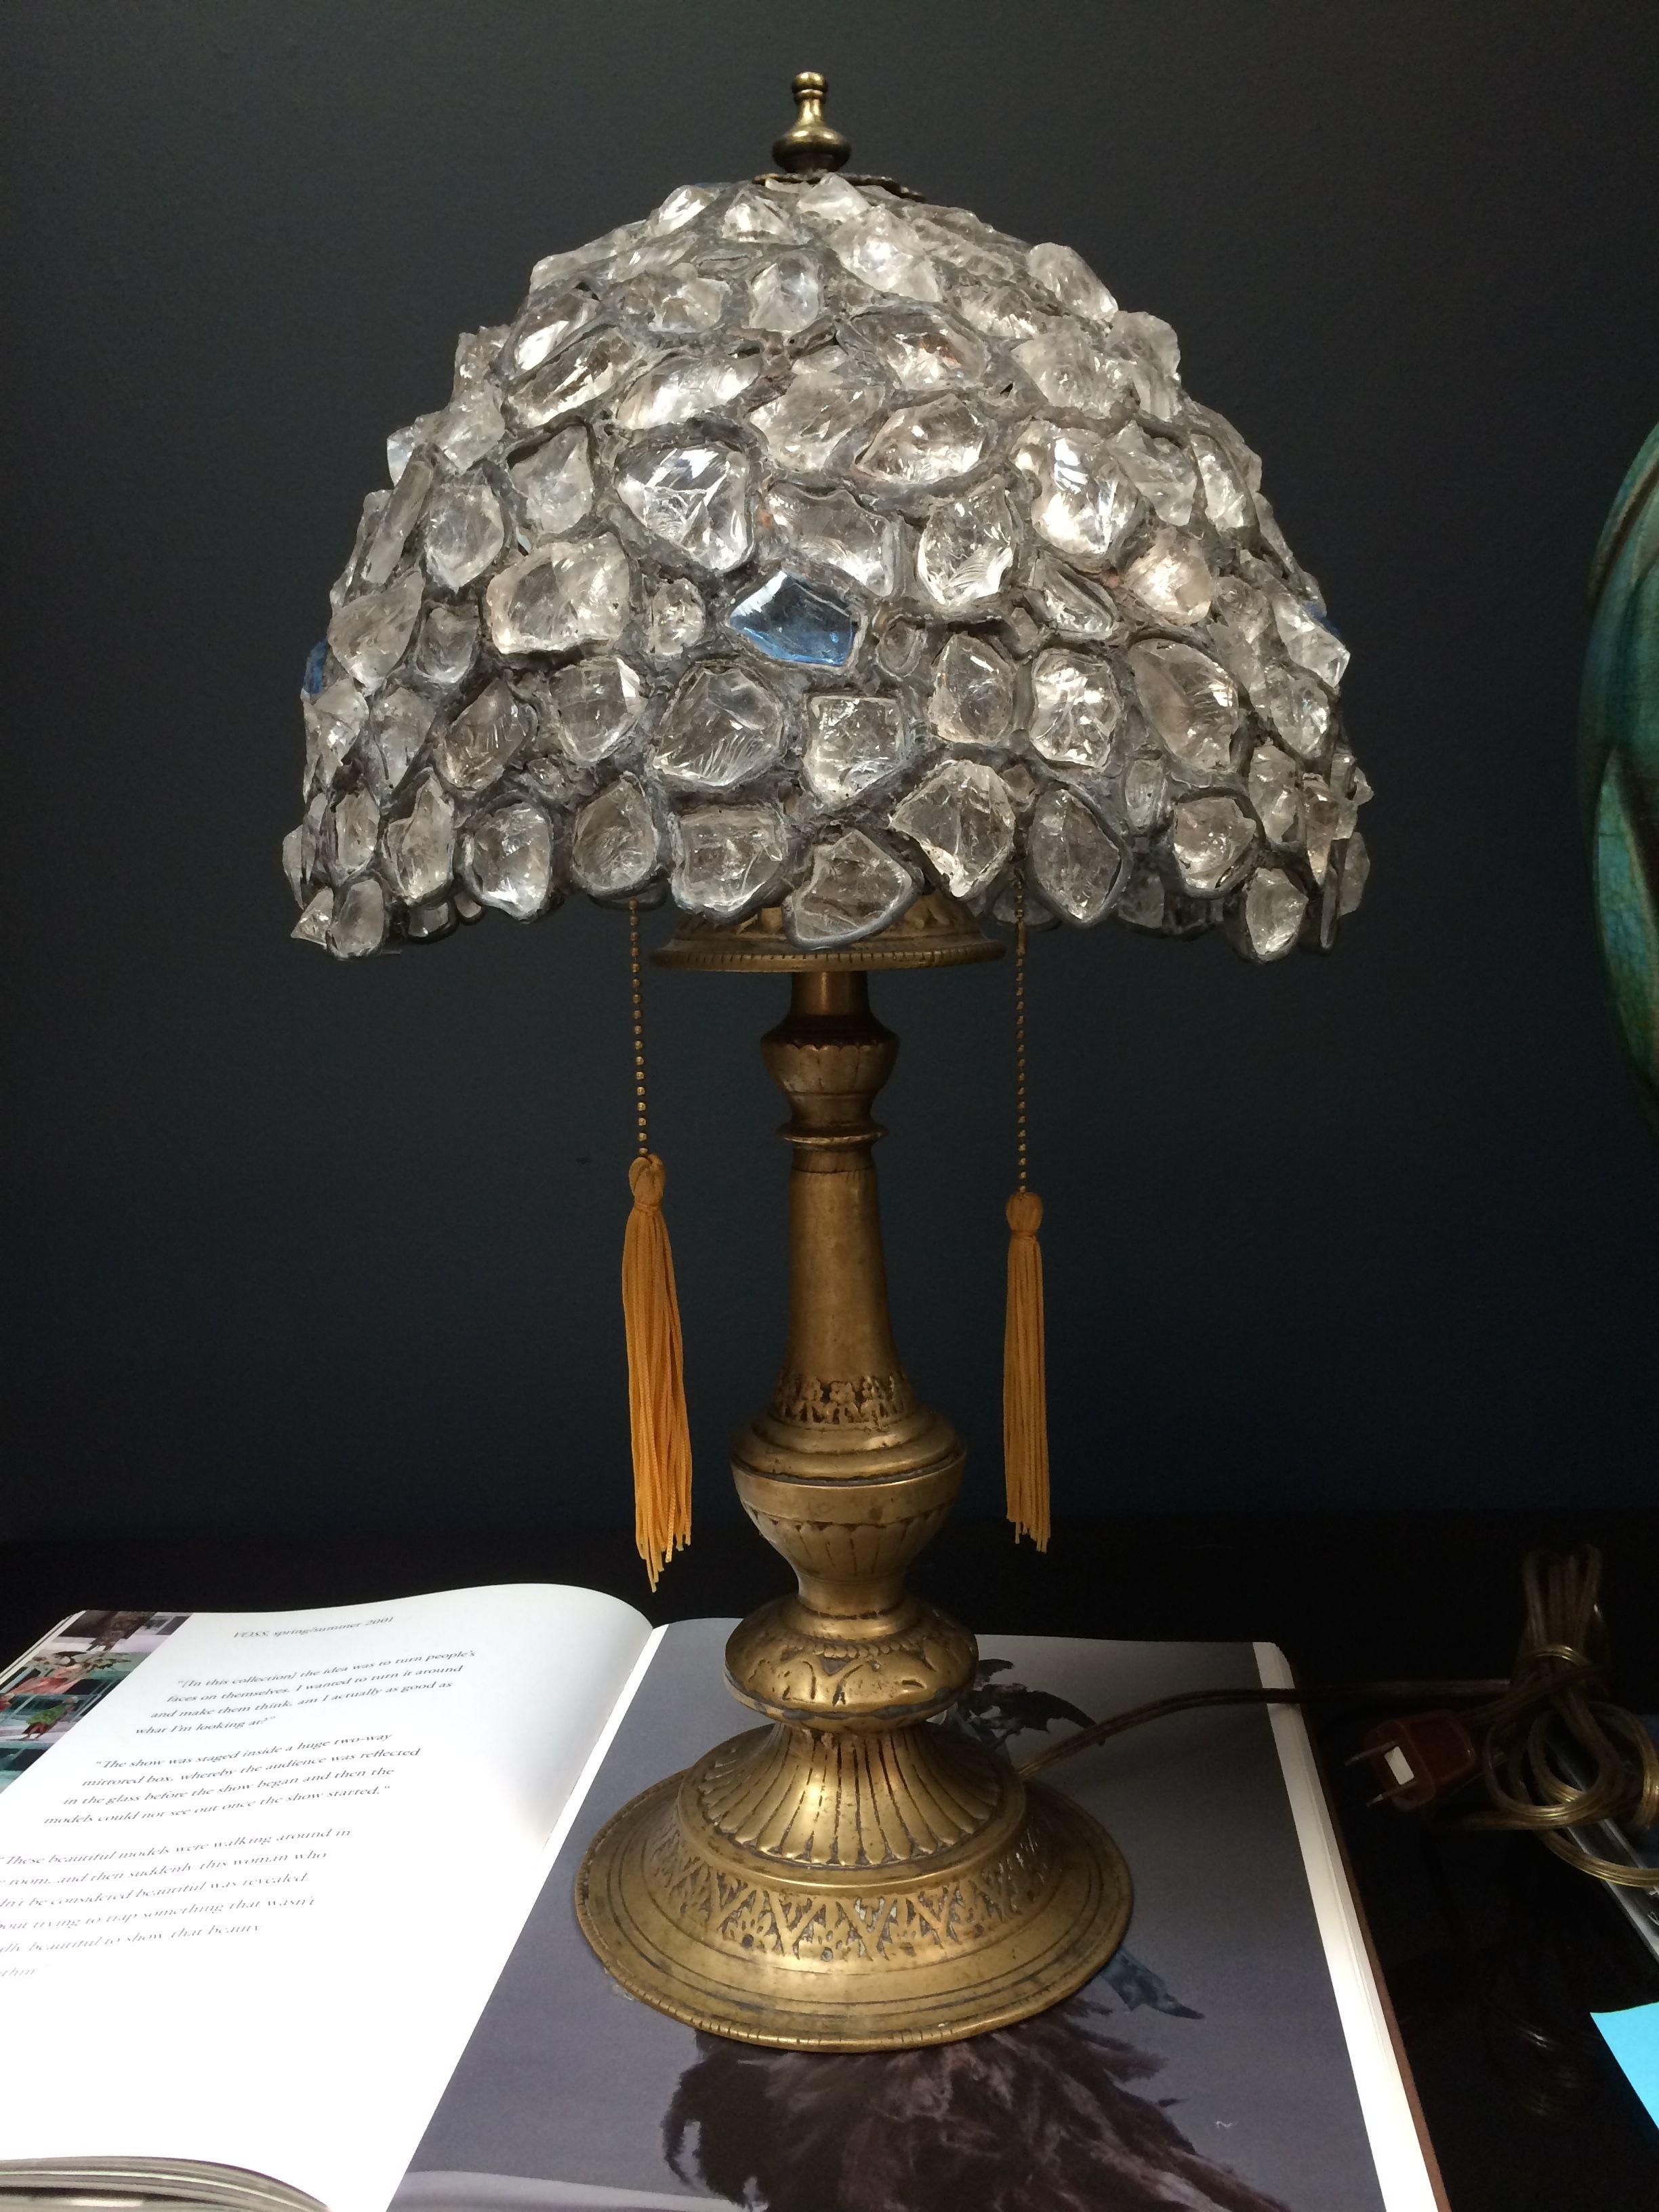 Rock Crystal table lamp - stunning | Shop | Darren ...